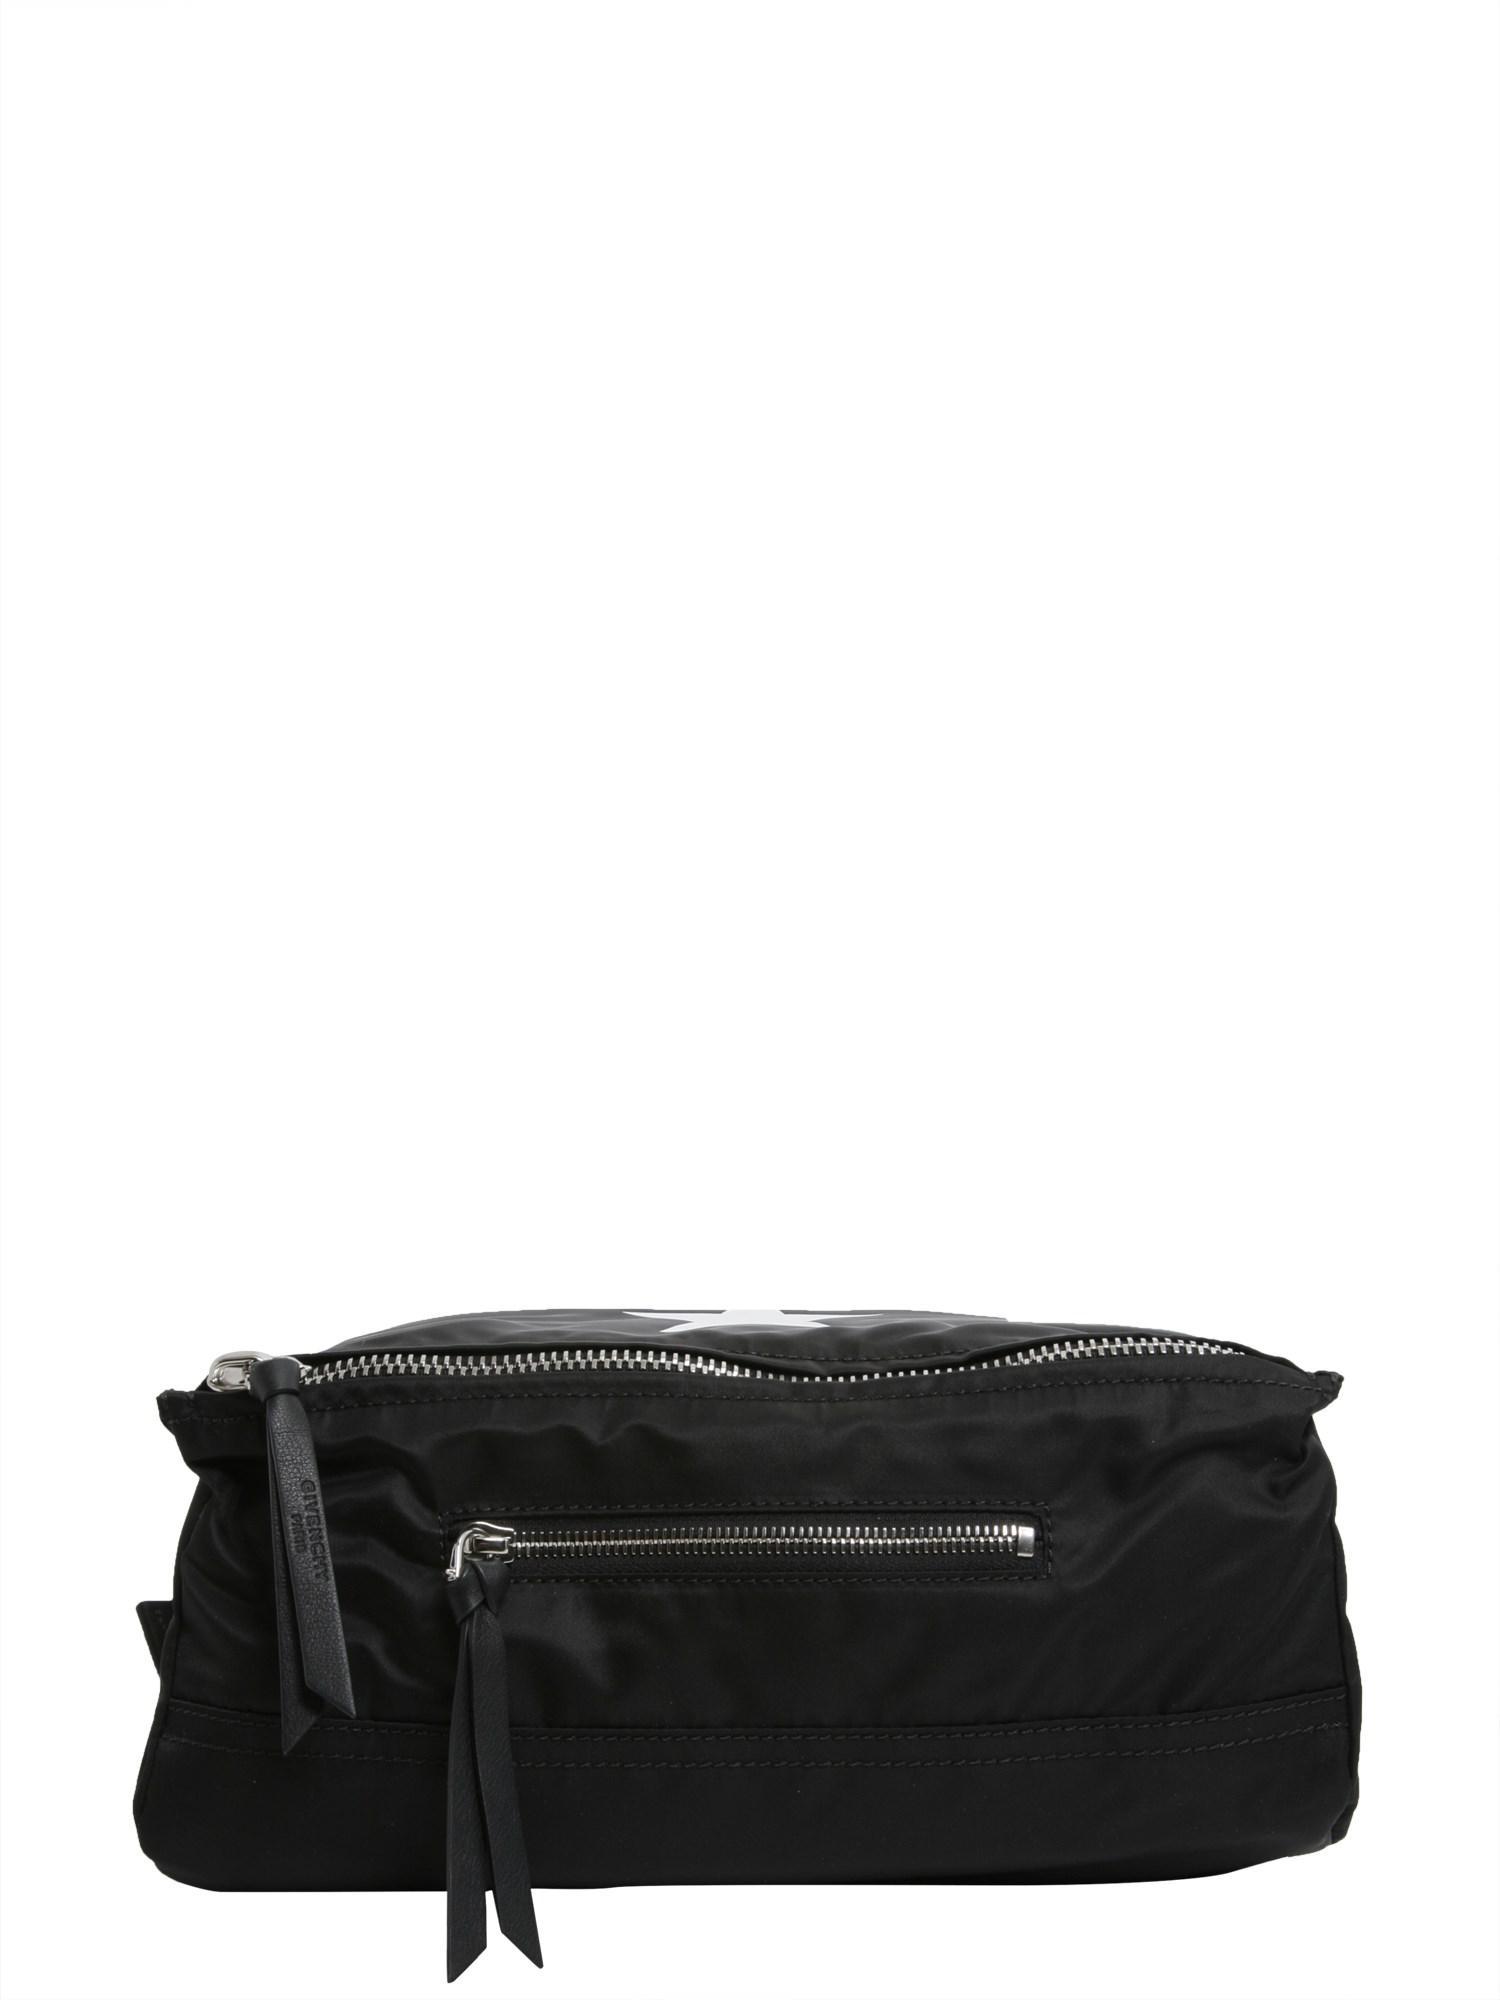 1ea388c7bf Givenchy Borsa Pandora Bum In Tessuto Tecnico in Black for Men - Lyst